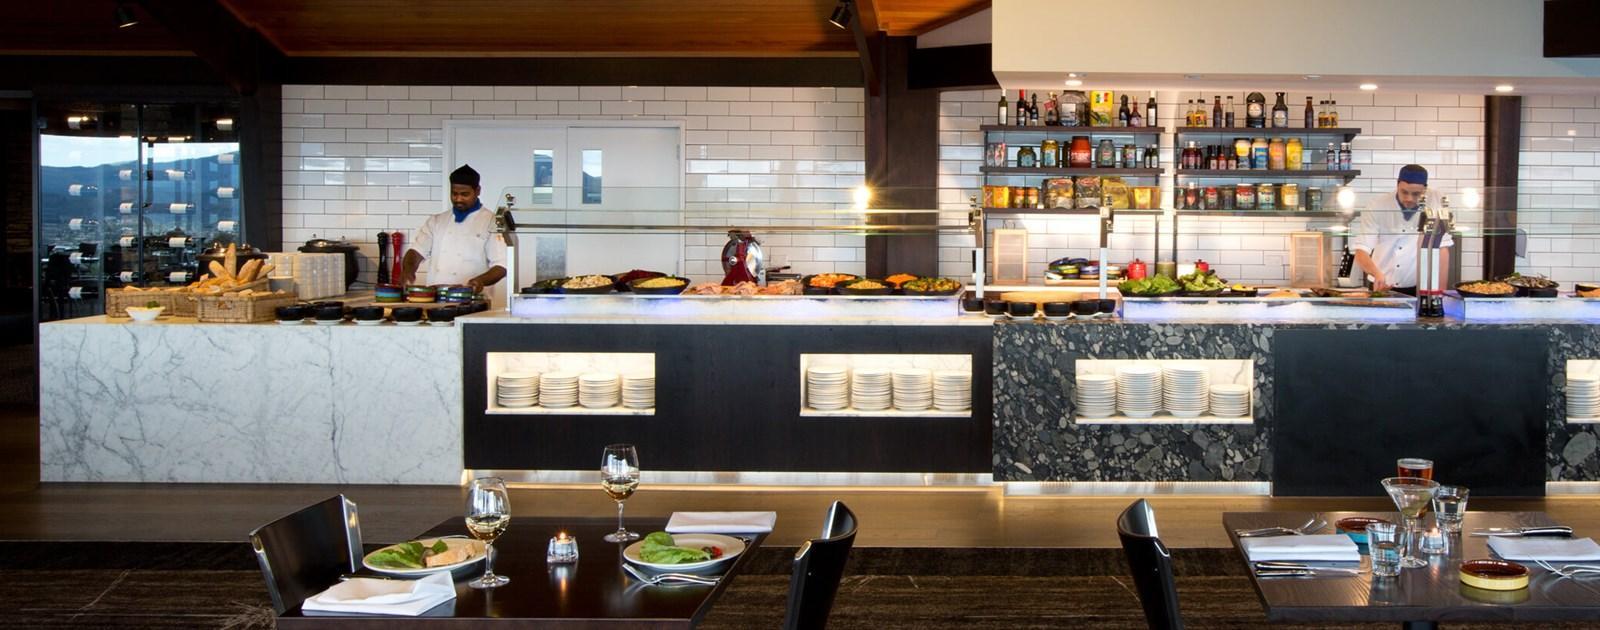 Stratosfare Restaurant Rotorua